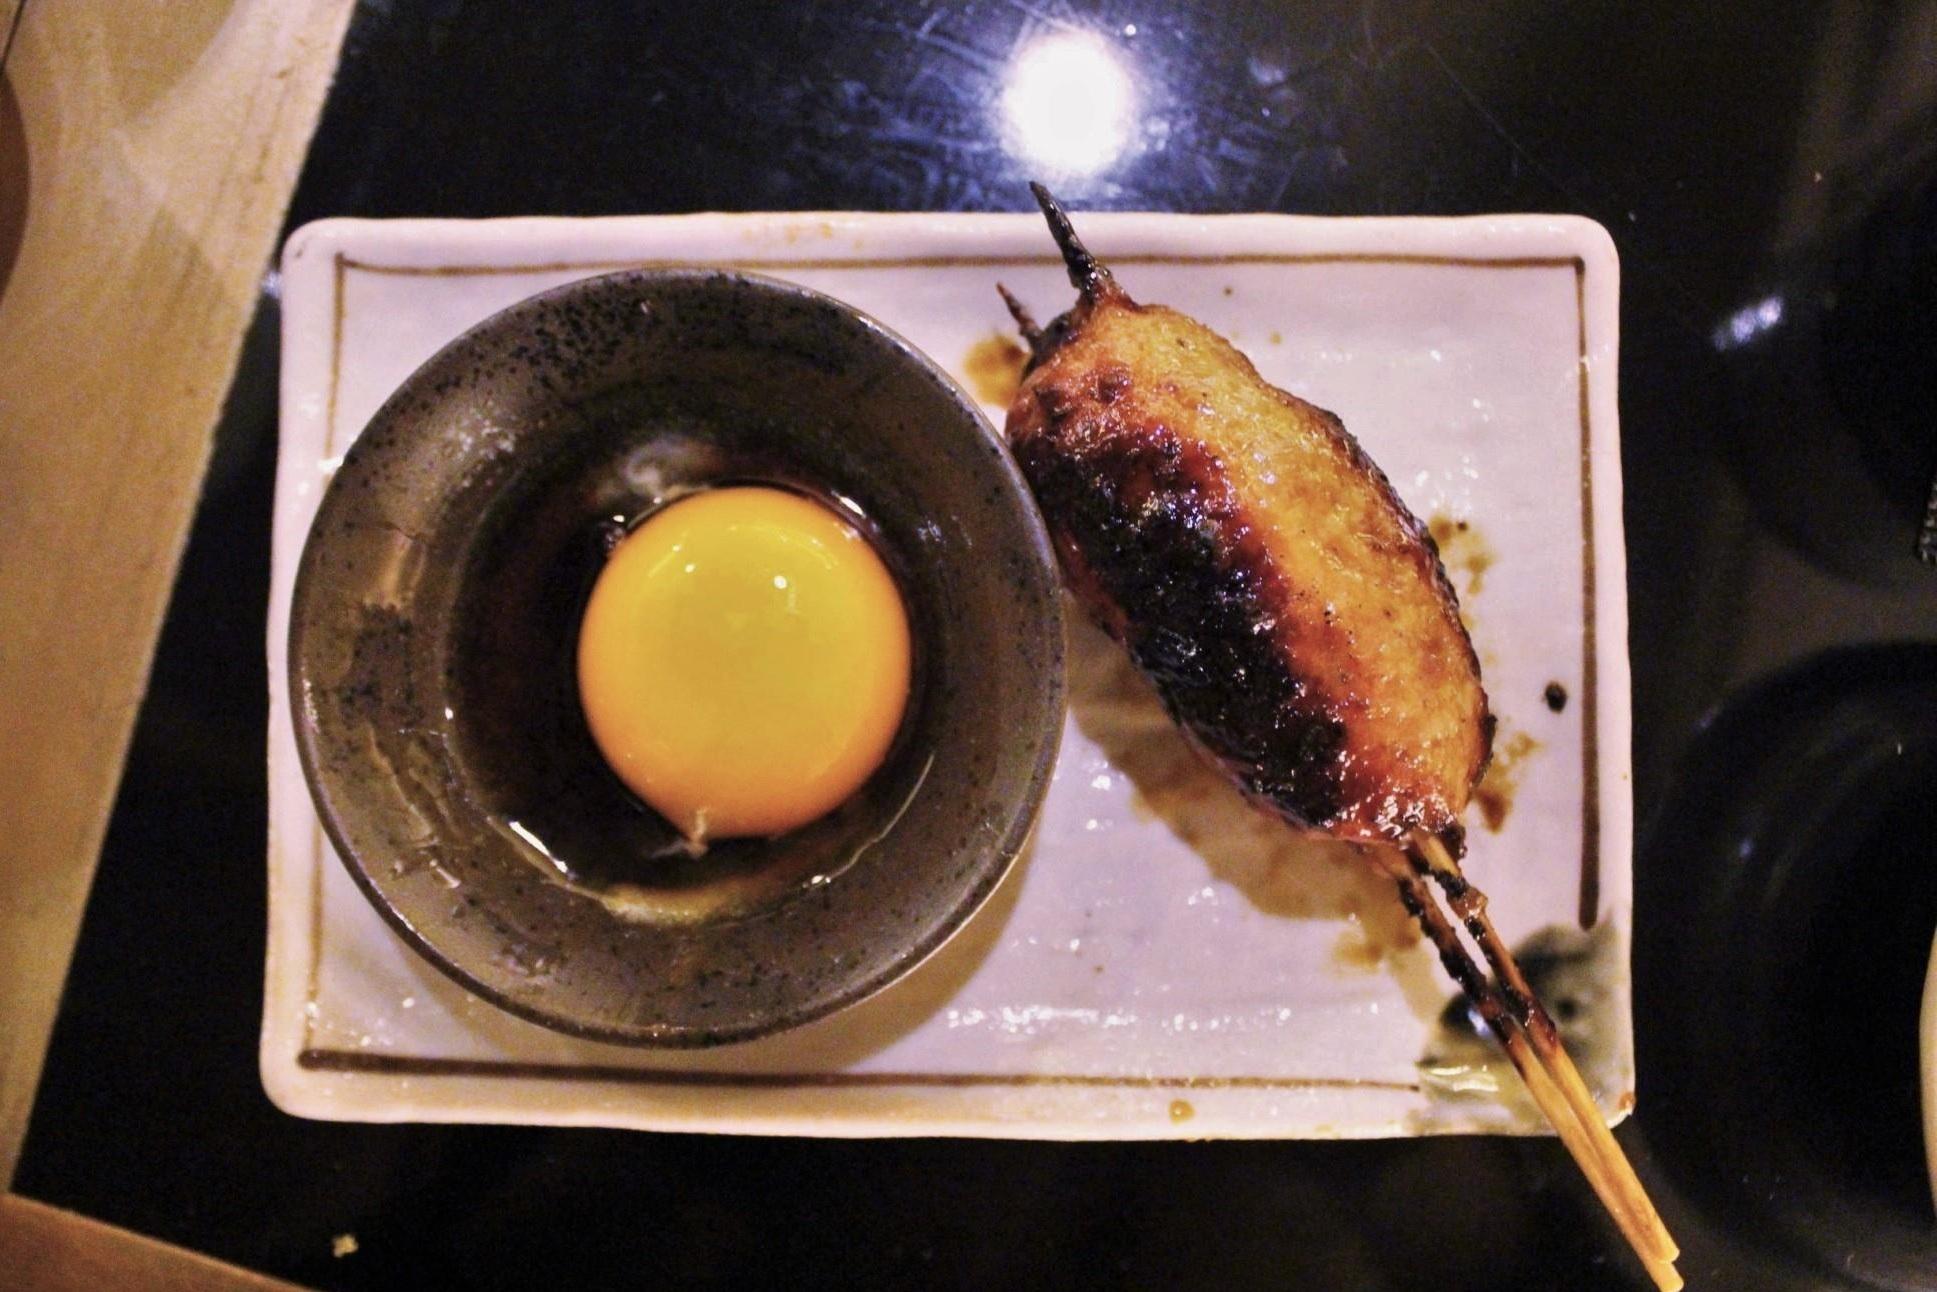 Chicken Meatball with Yolk at Torishin